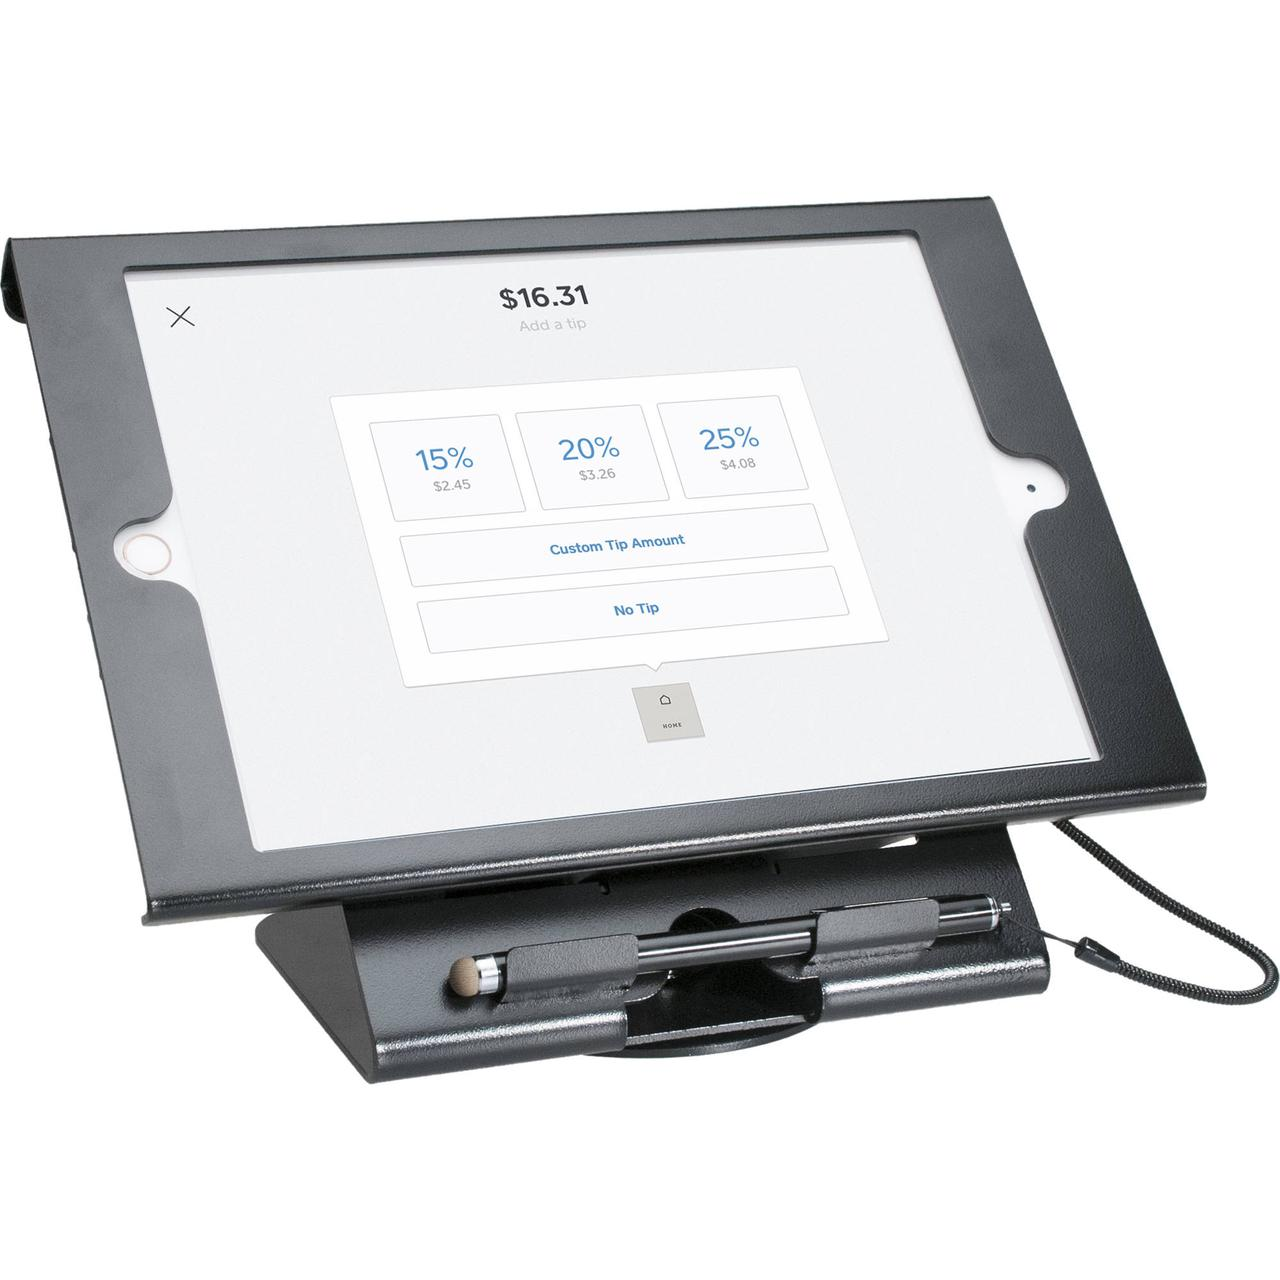 Защитная подставка для iPad Air и iPad Pro 9.7 PAD-DSCKA